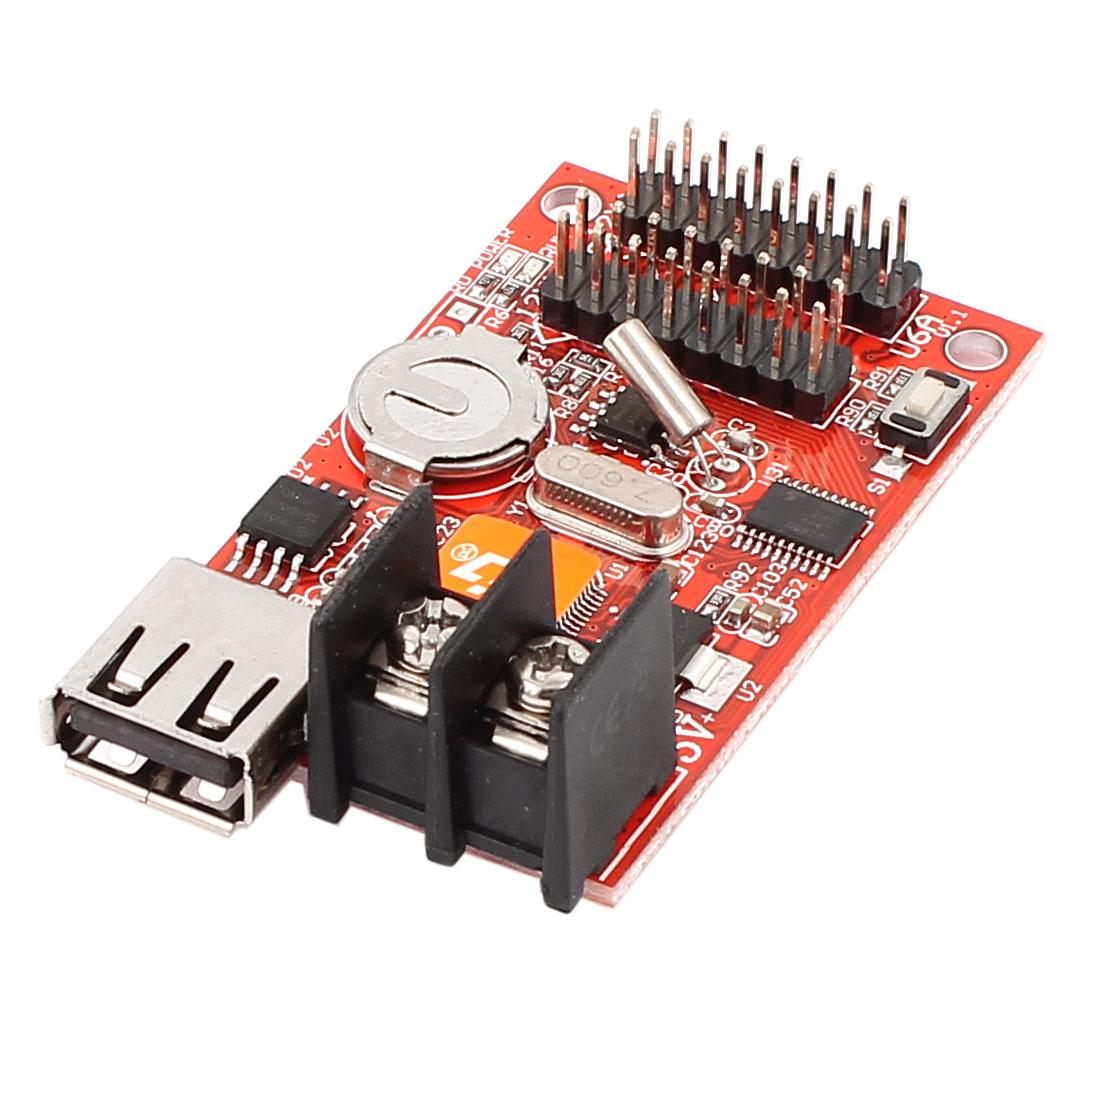 HD-U6A USB Port U-disk LED Screen Display Control Card P10 Module